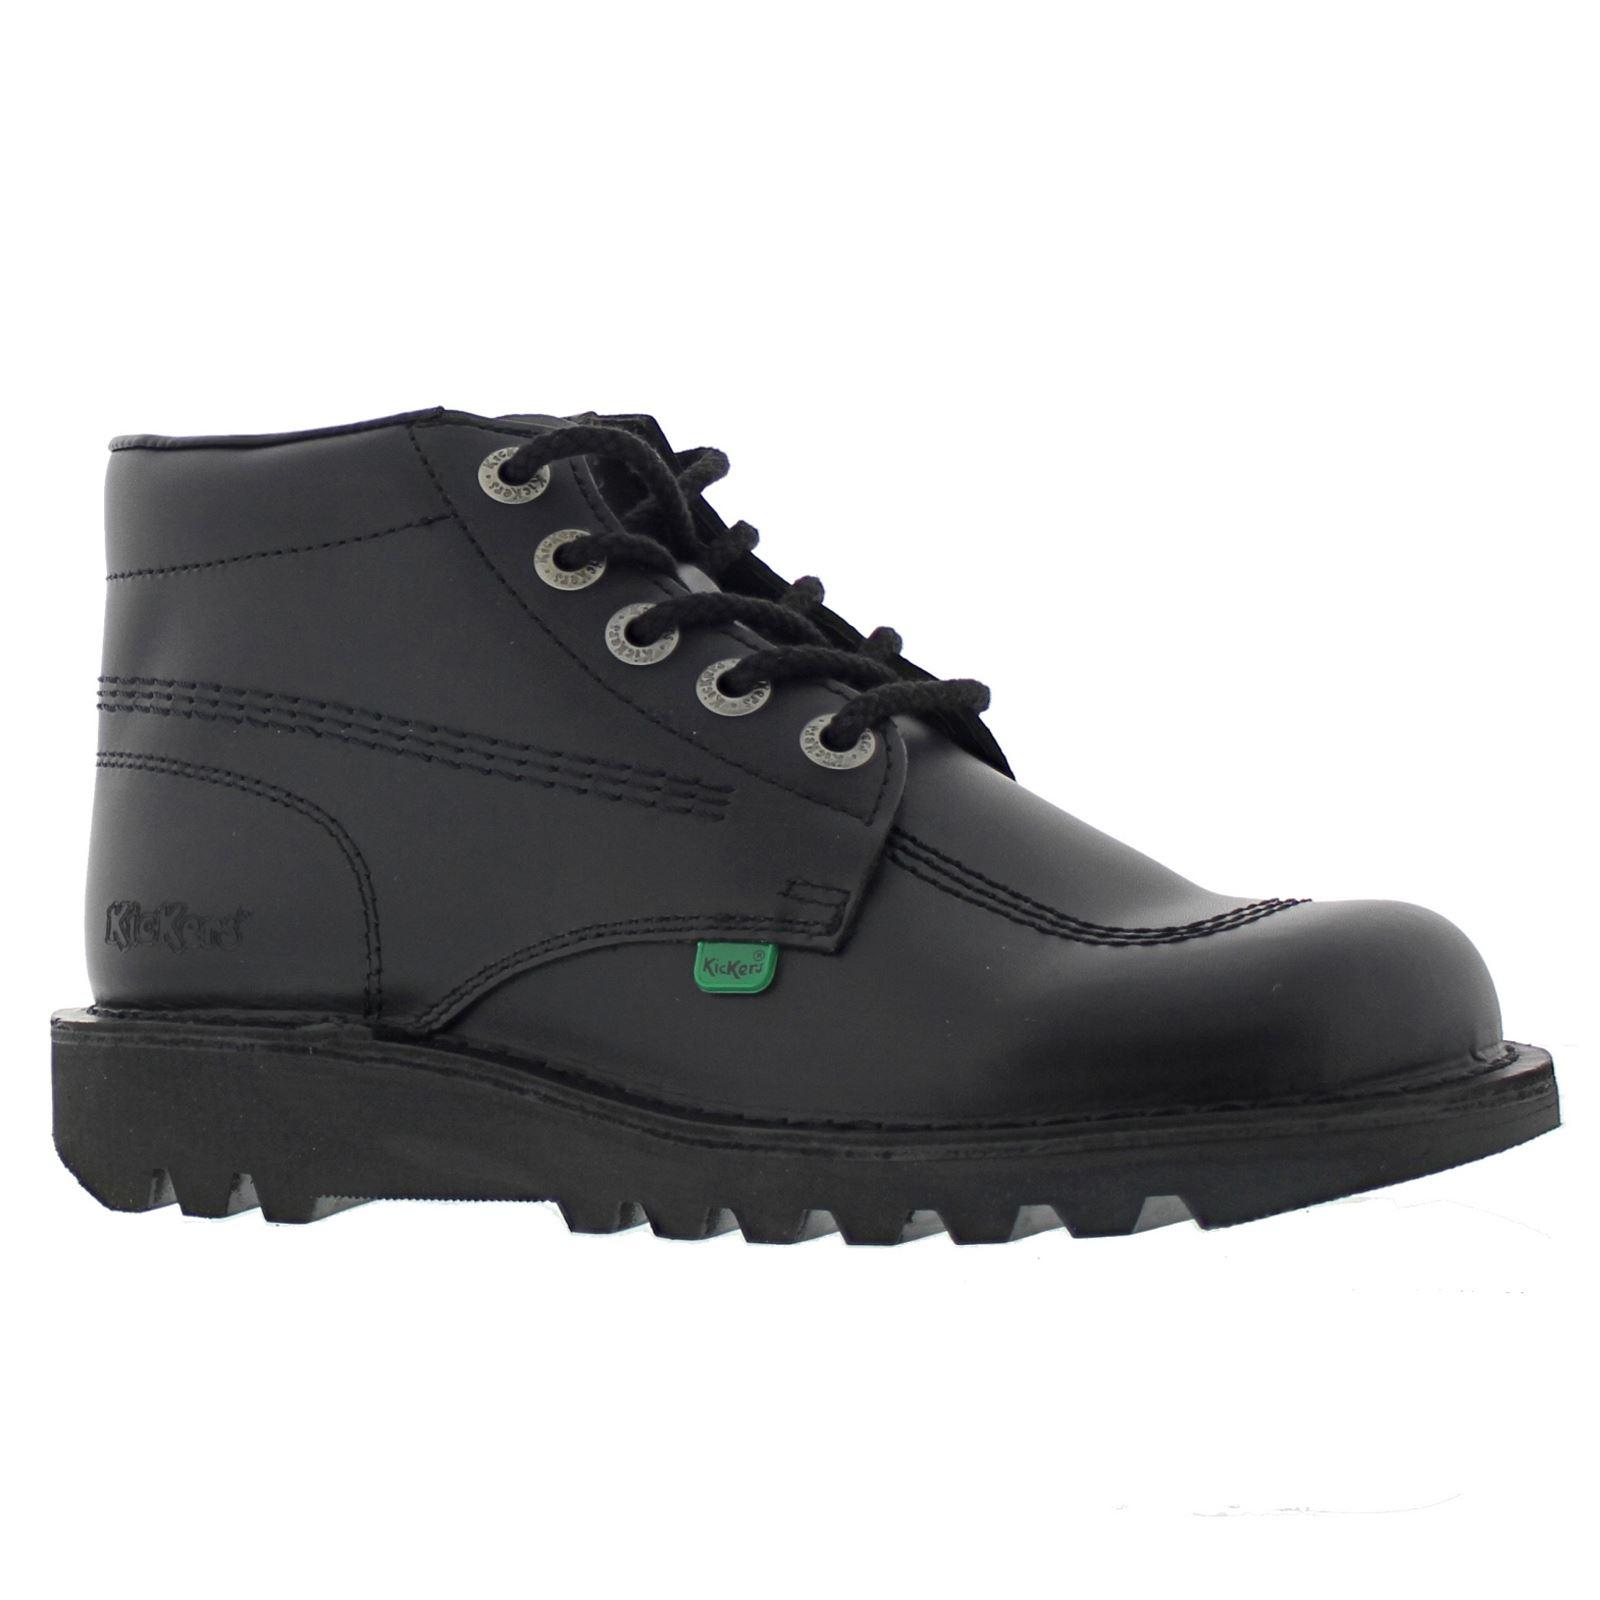 Kickers Kick Hi Core Black Womens Shoes | eBay